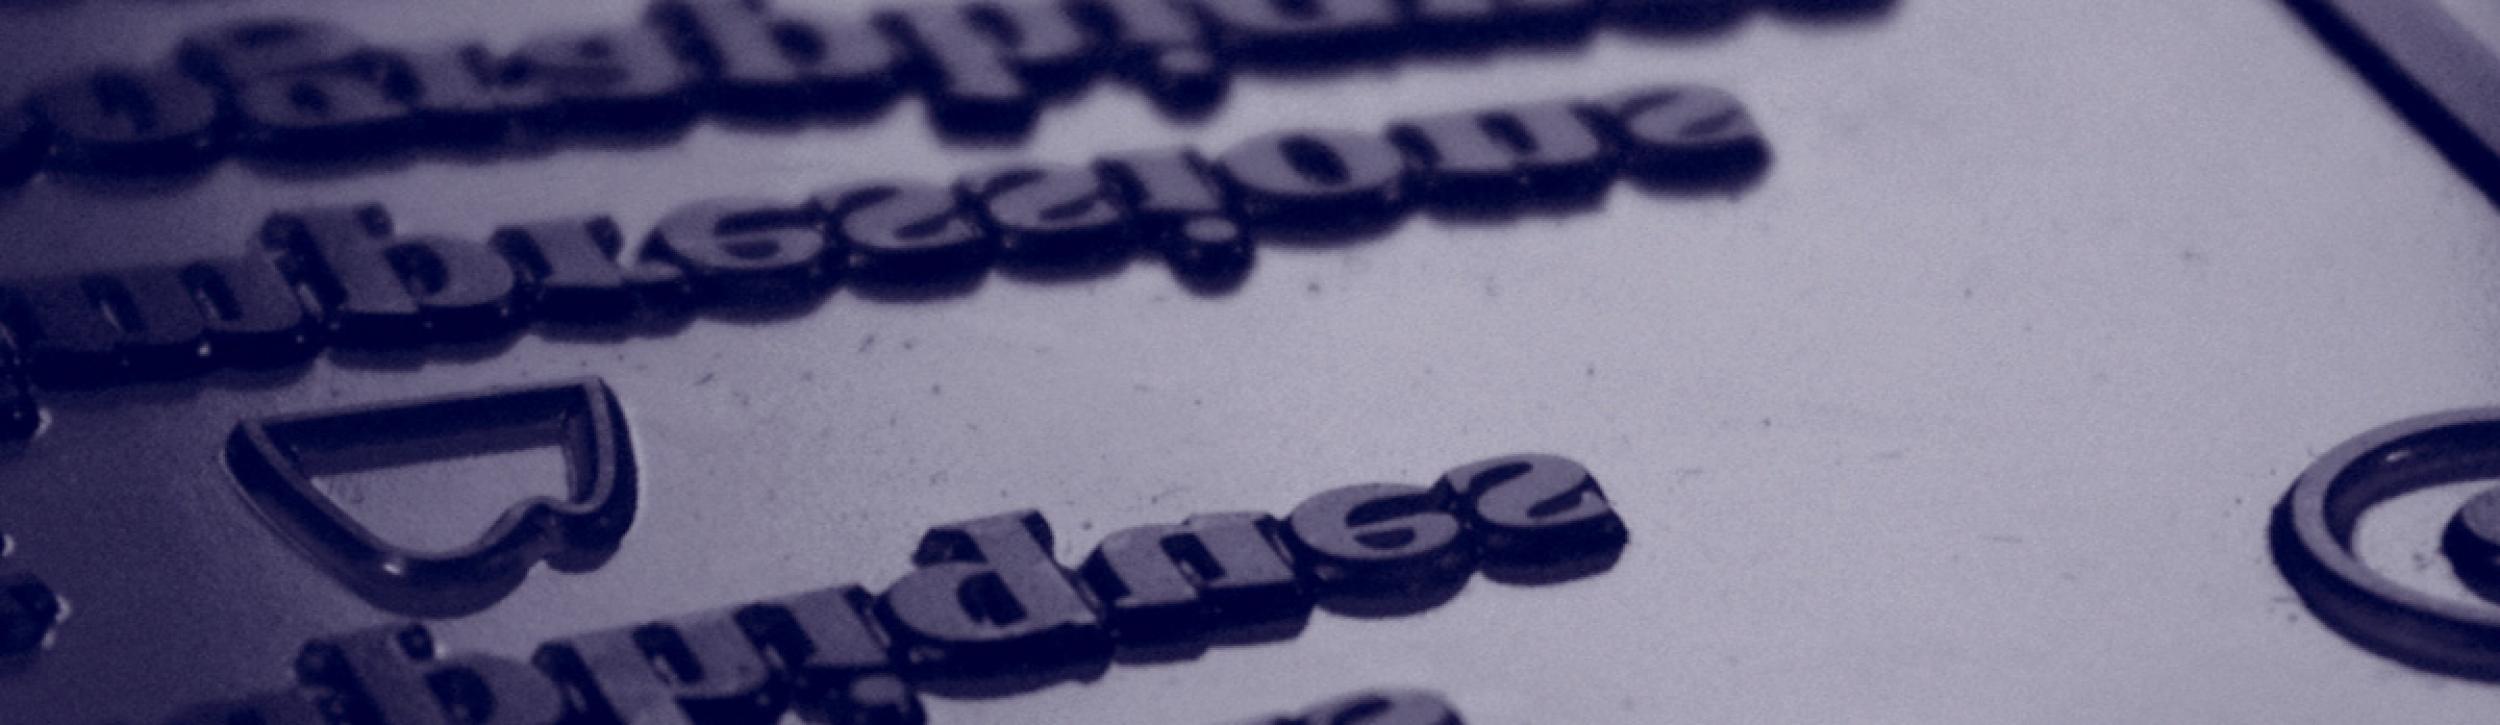 Impression letterpress